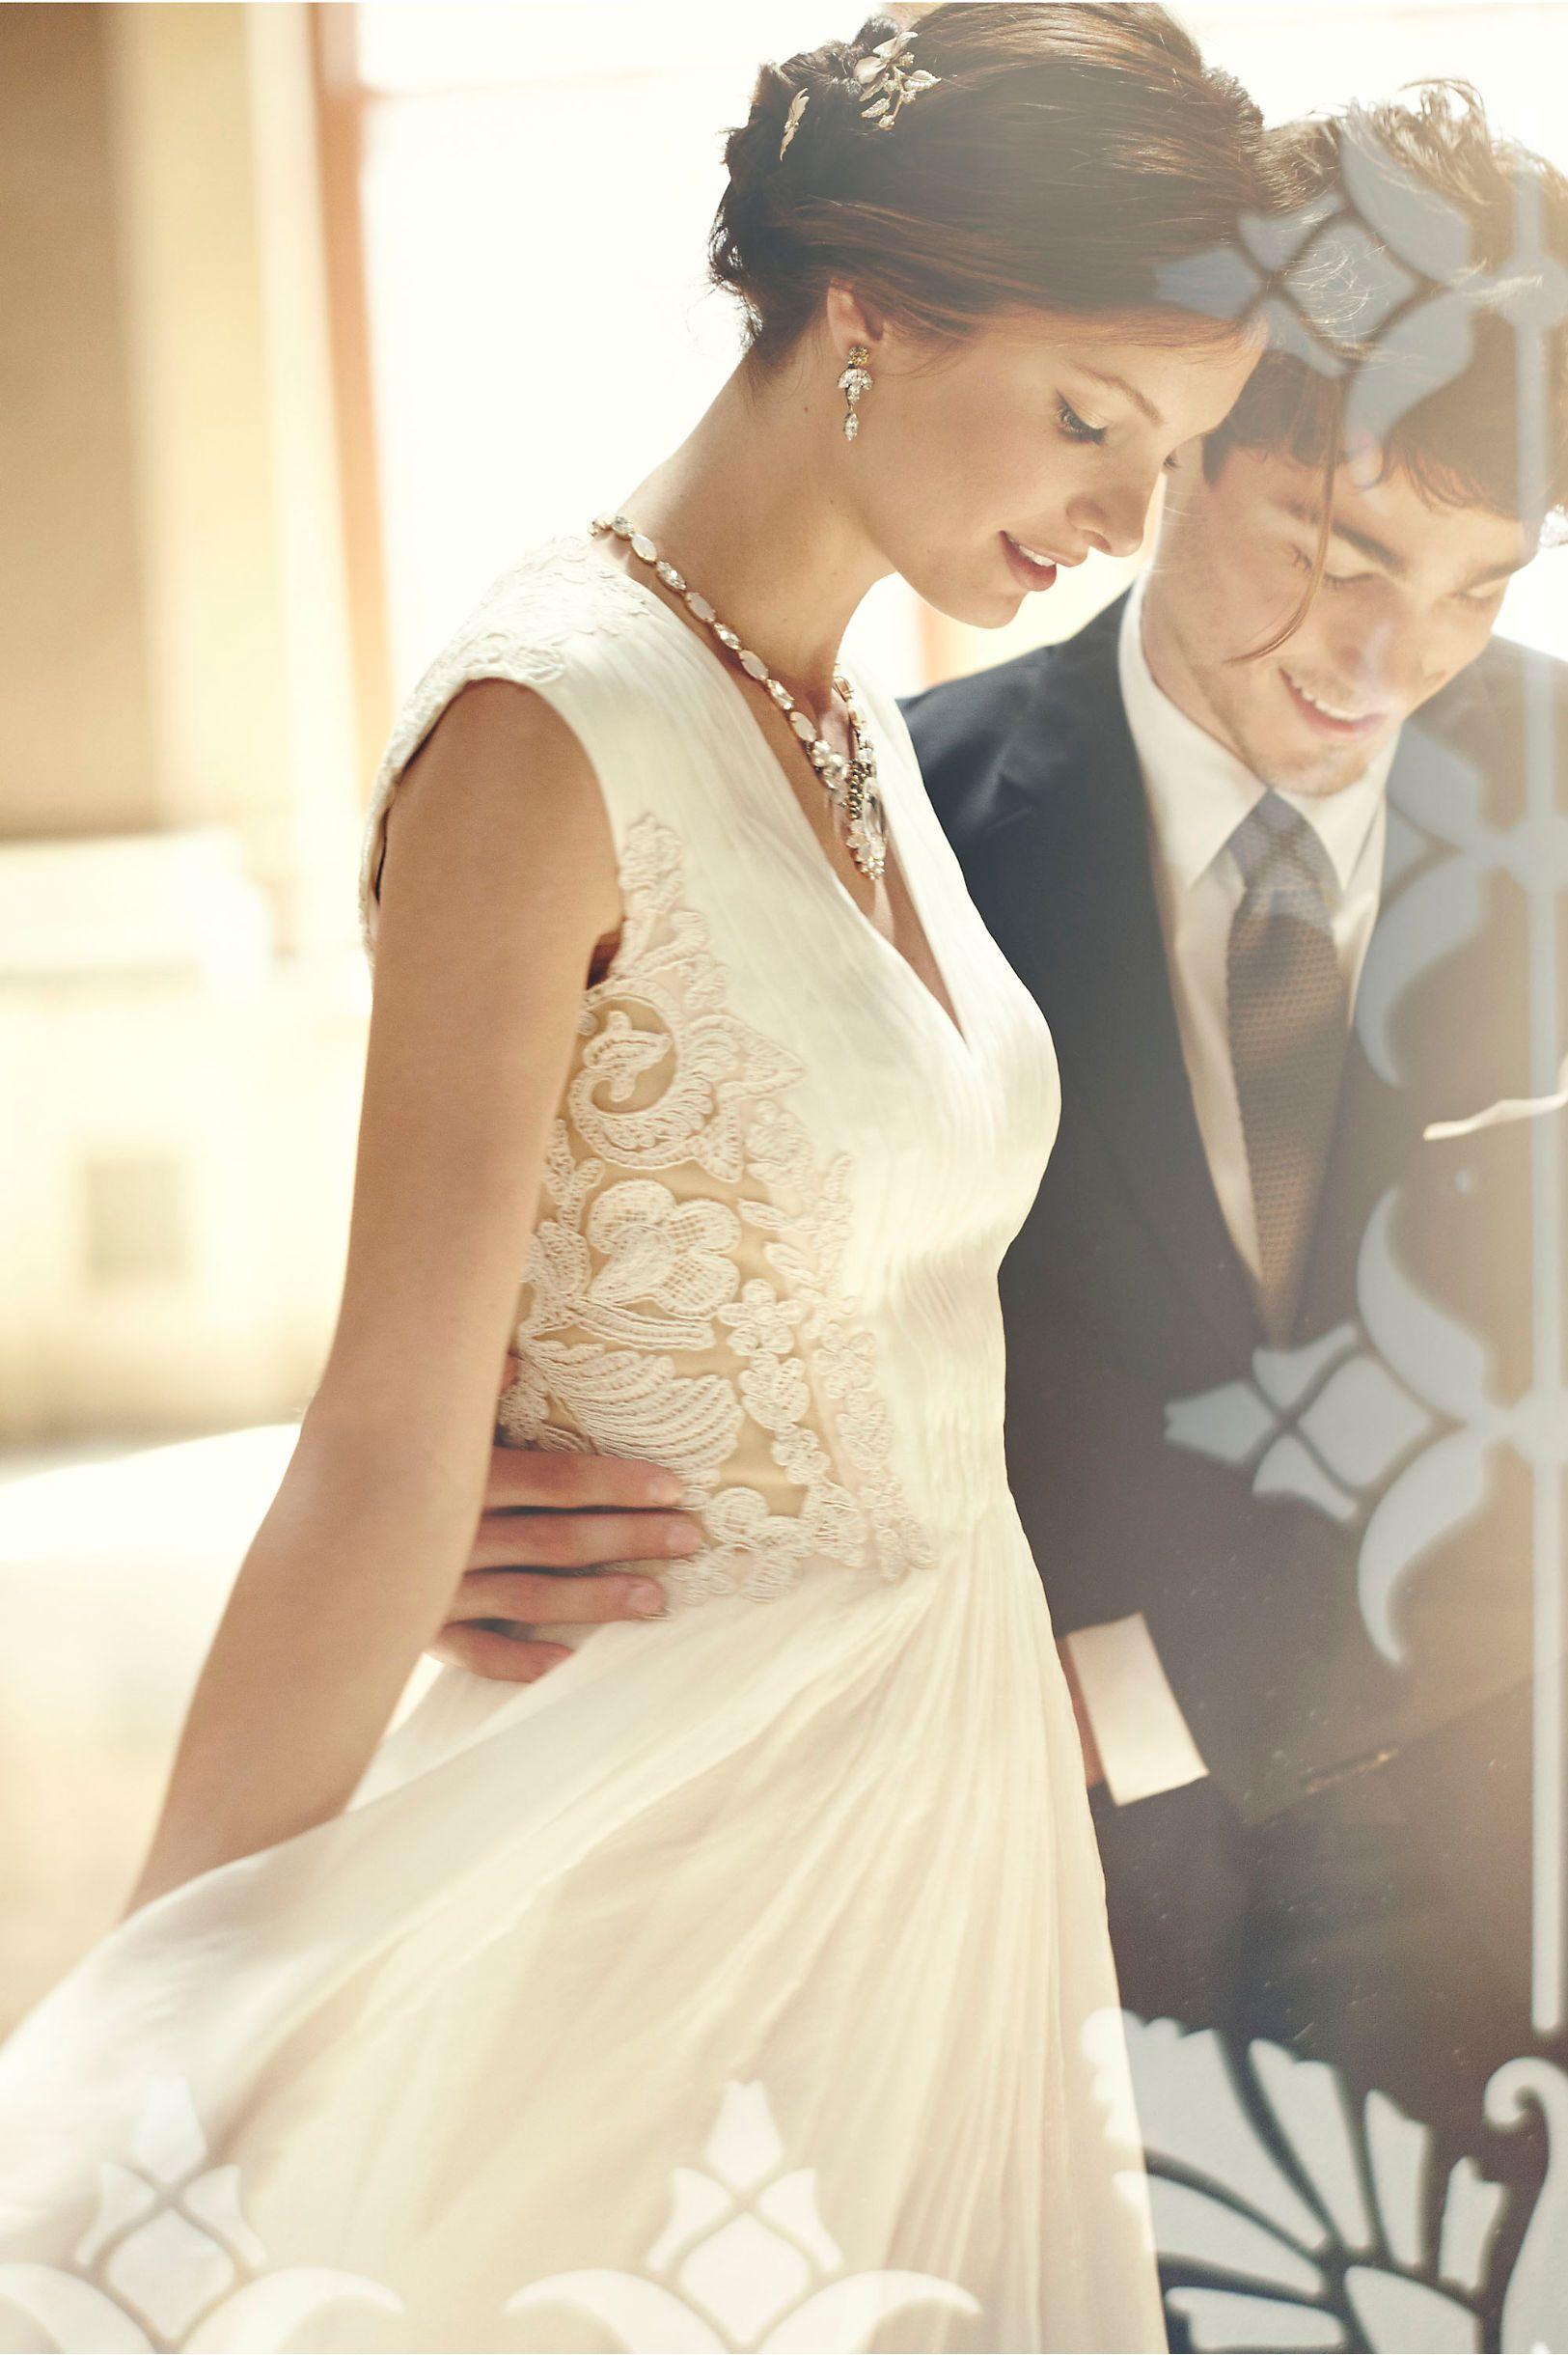 Long wedding reception dresses for the bride  Lara Dress from BHLDN  Wedding Business  Pinterest  Bride